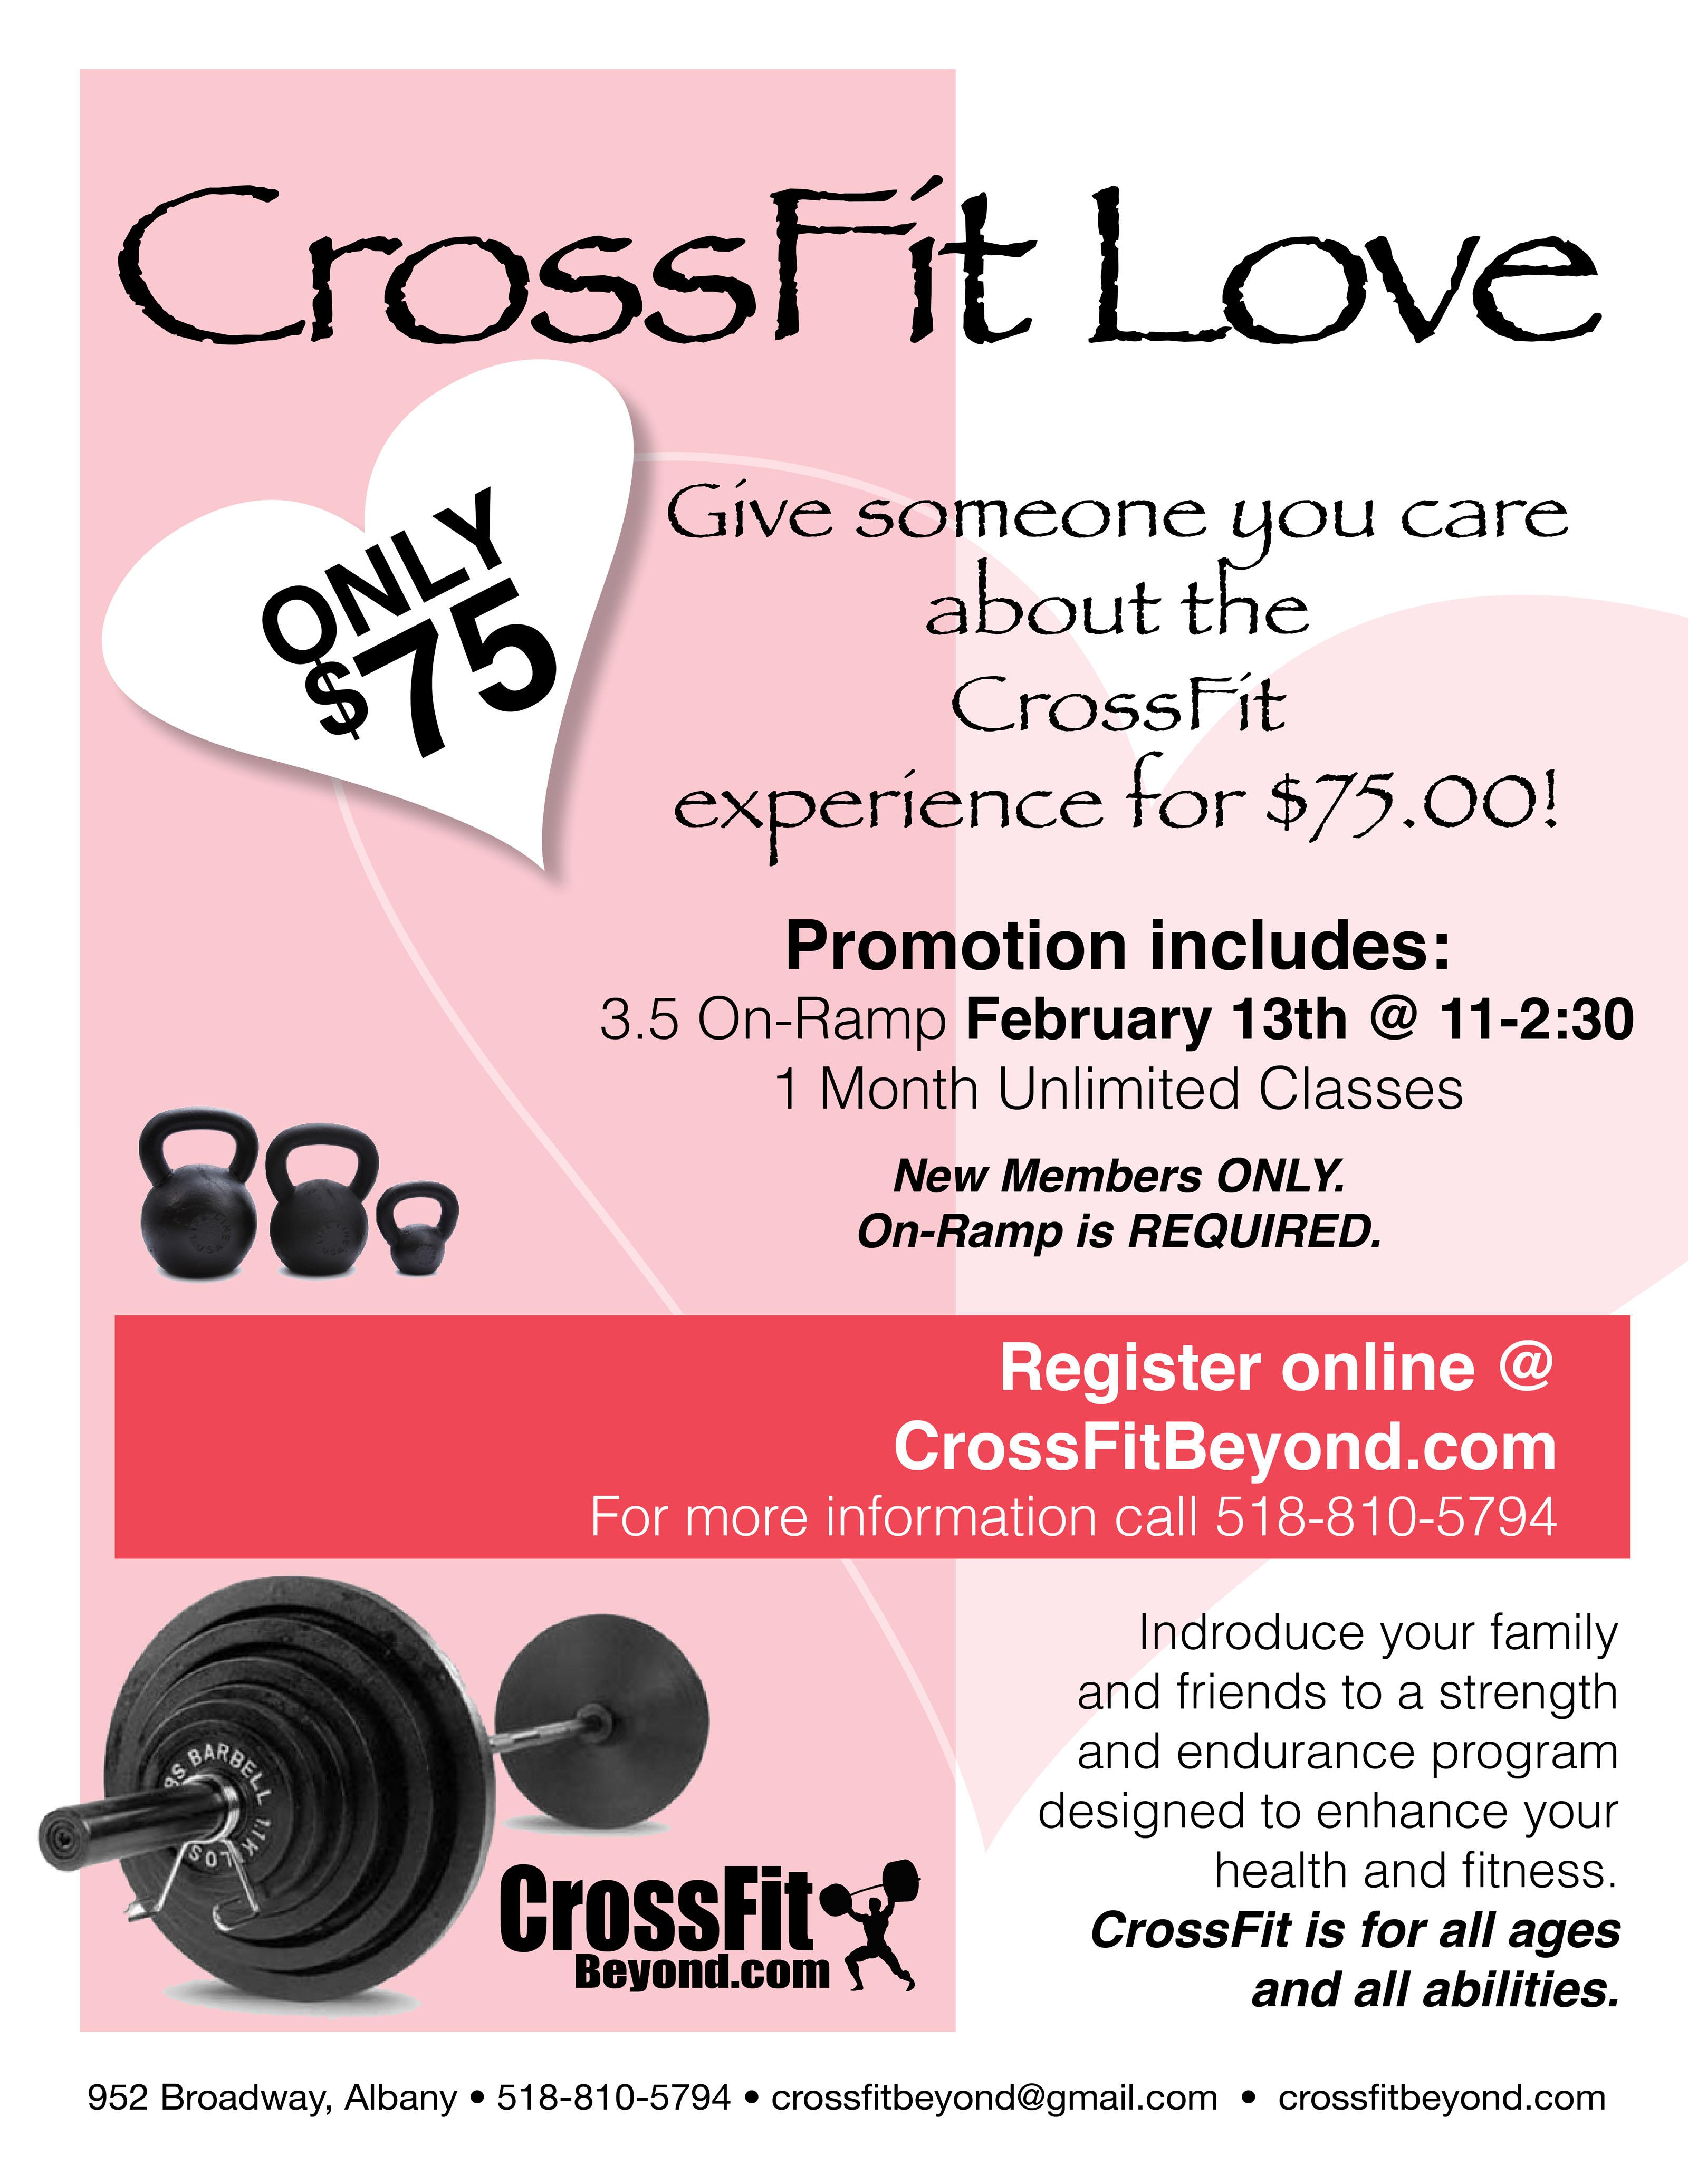 CrossFit Love 2016